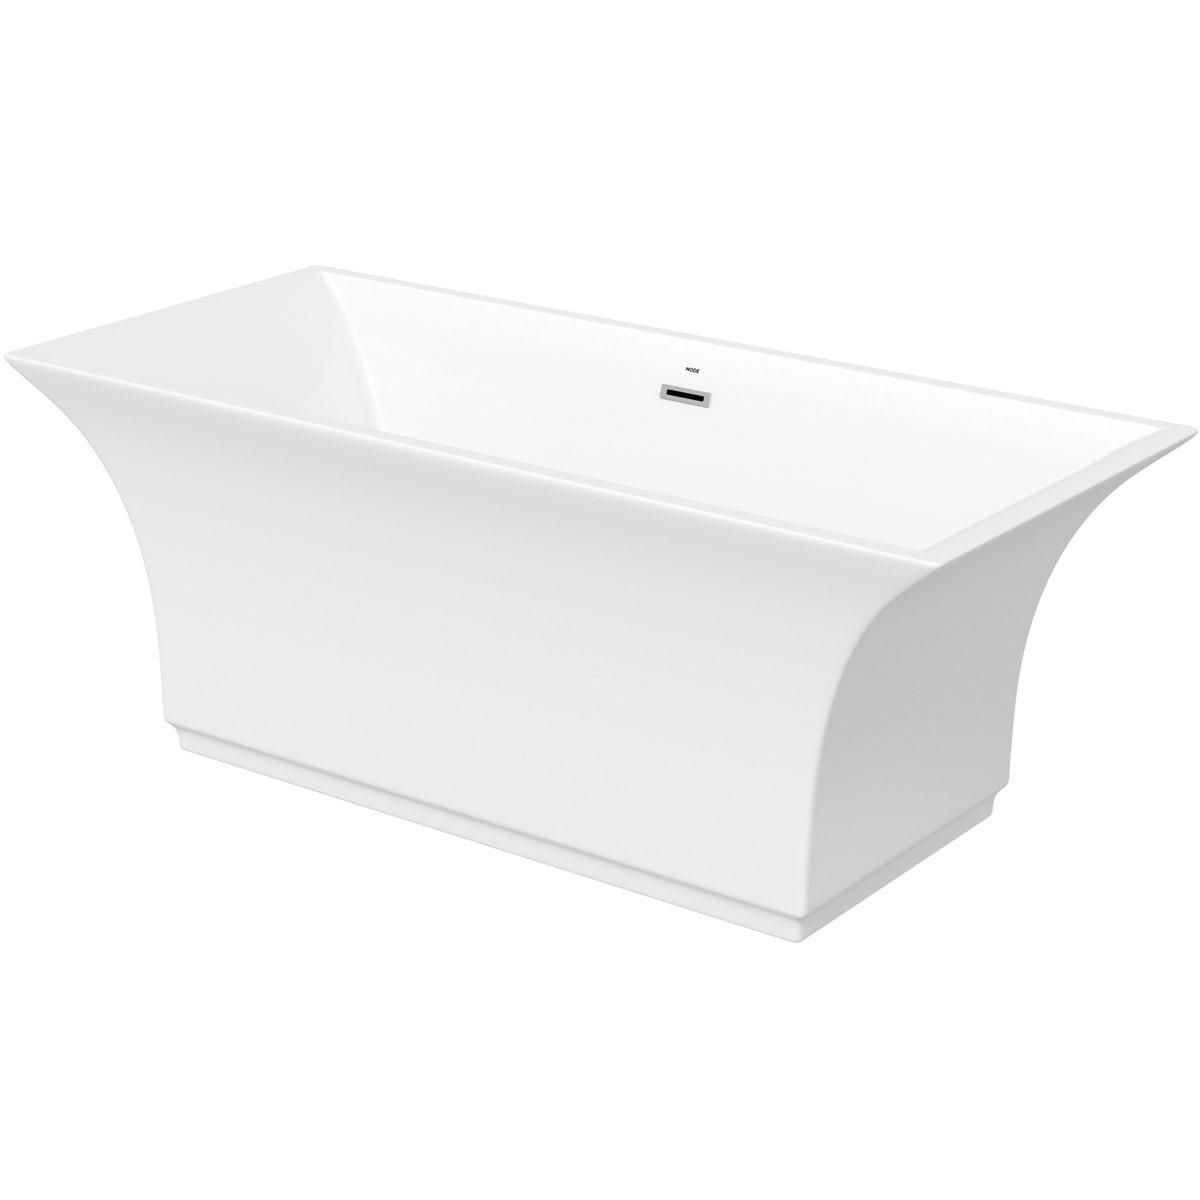 Mode Austin freestanding bath 1700 x 750